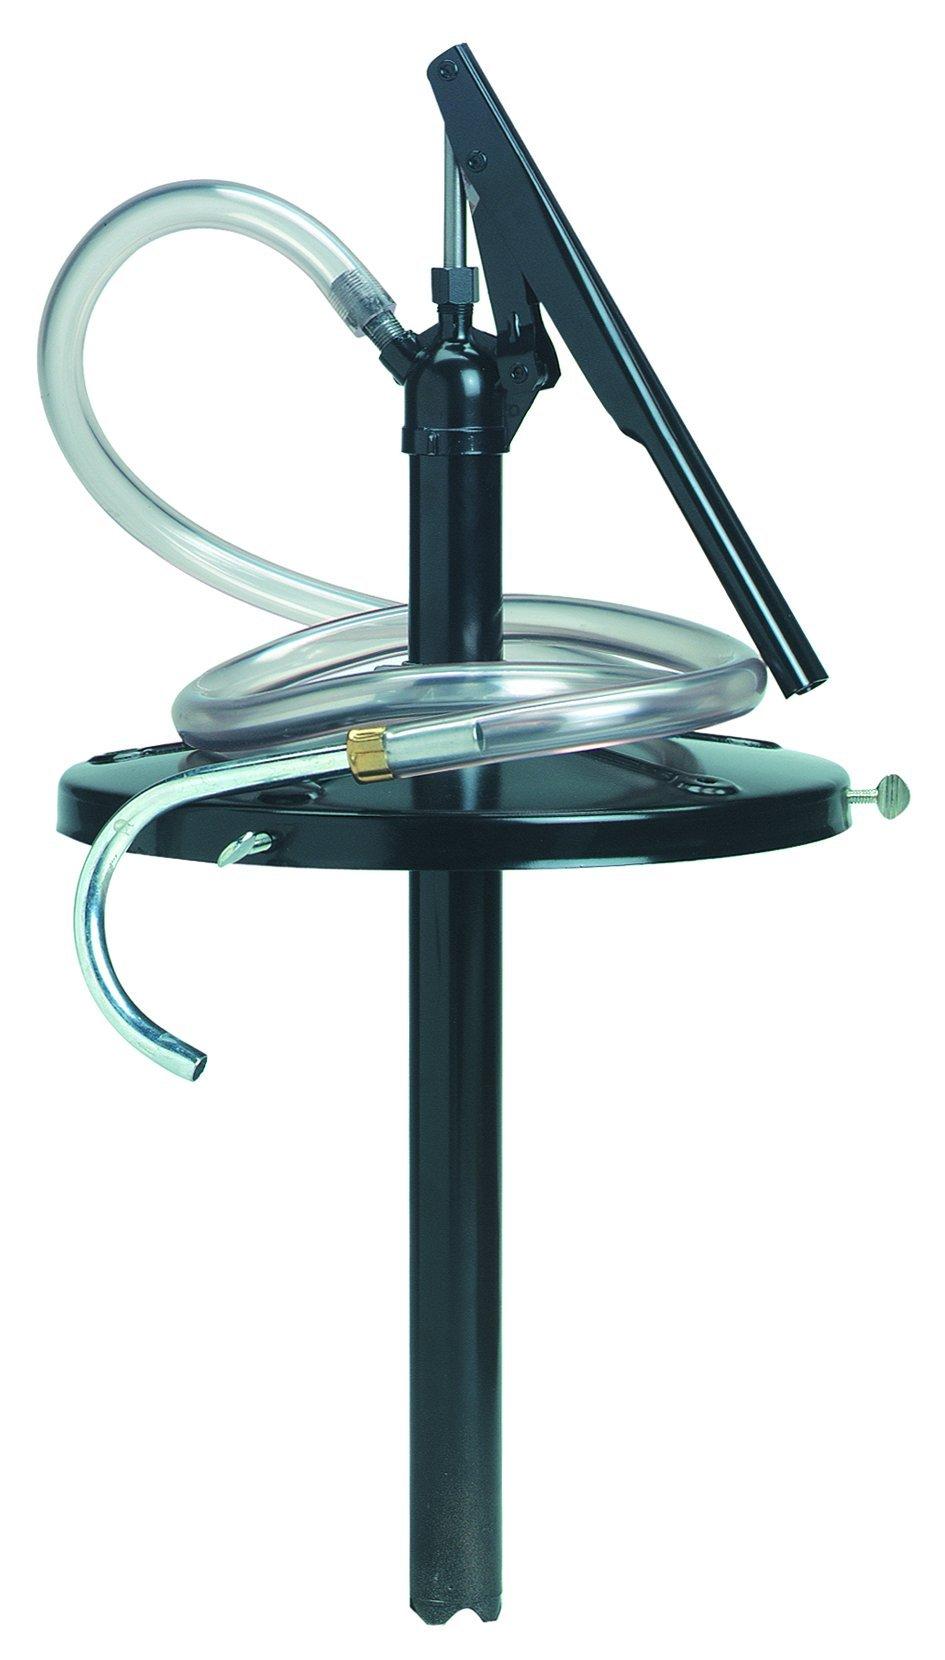 Plews 55-440 Lever Action Dispenser